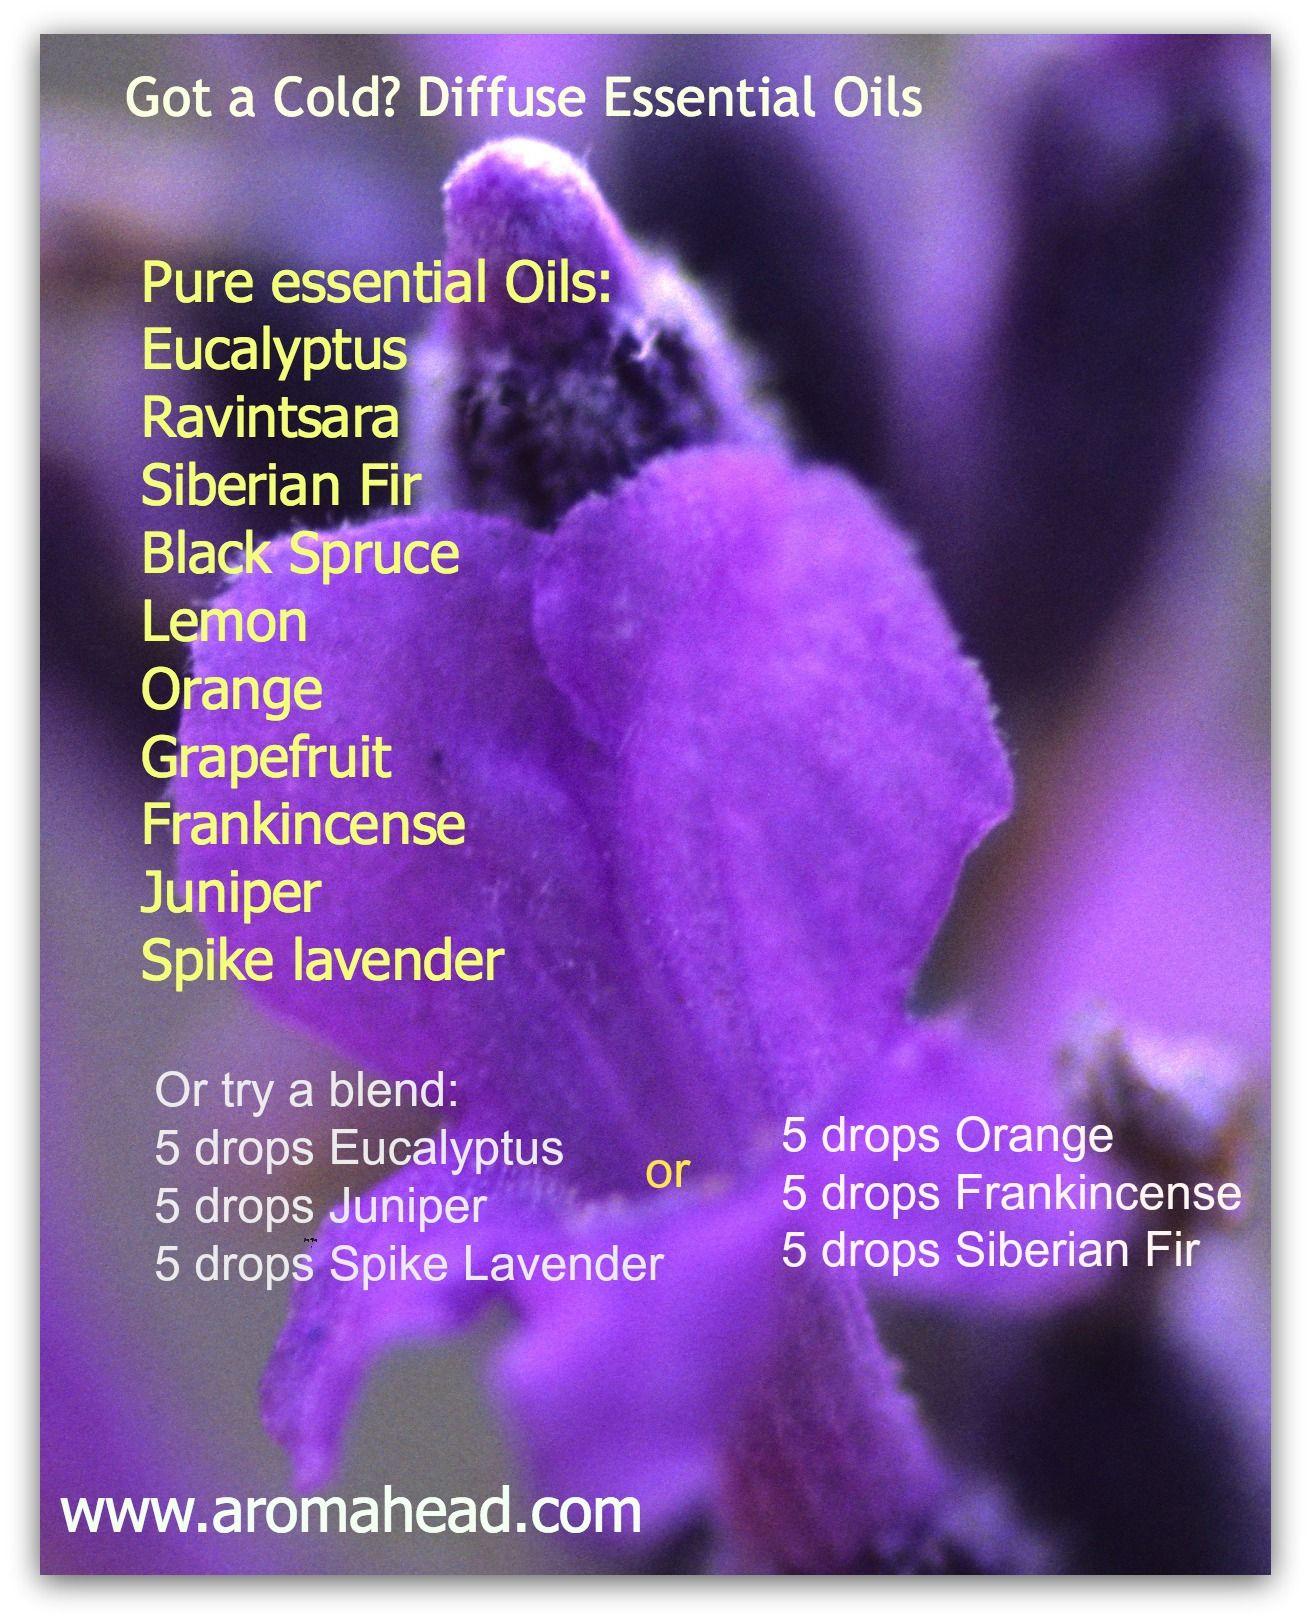 Got A Cold Diffuse Essential Oils Essential Oils For Colds